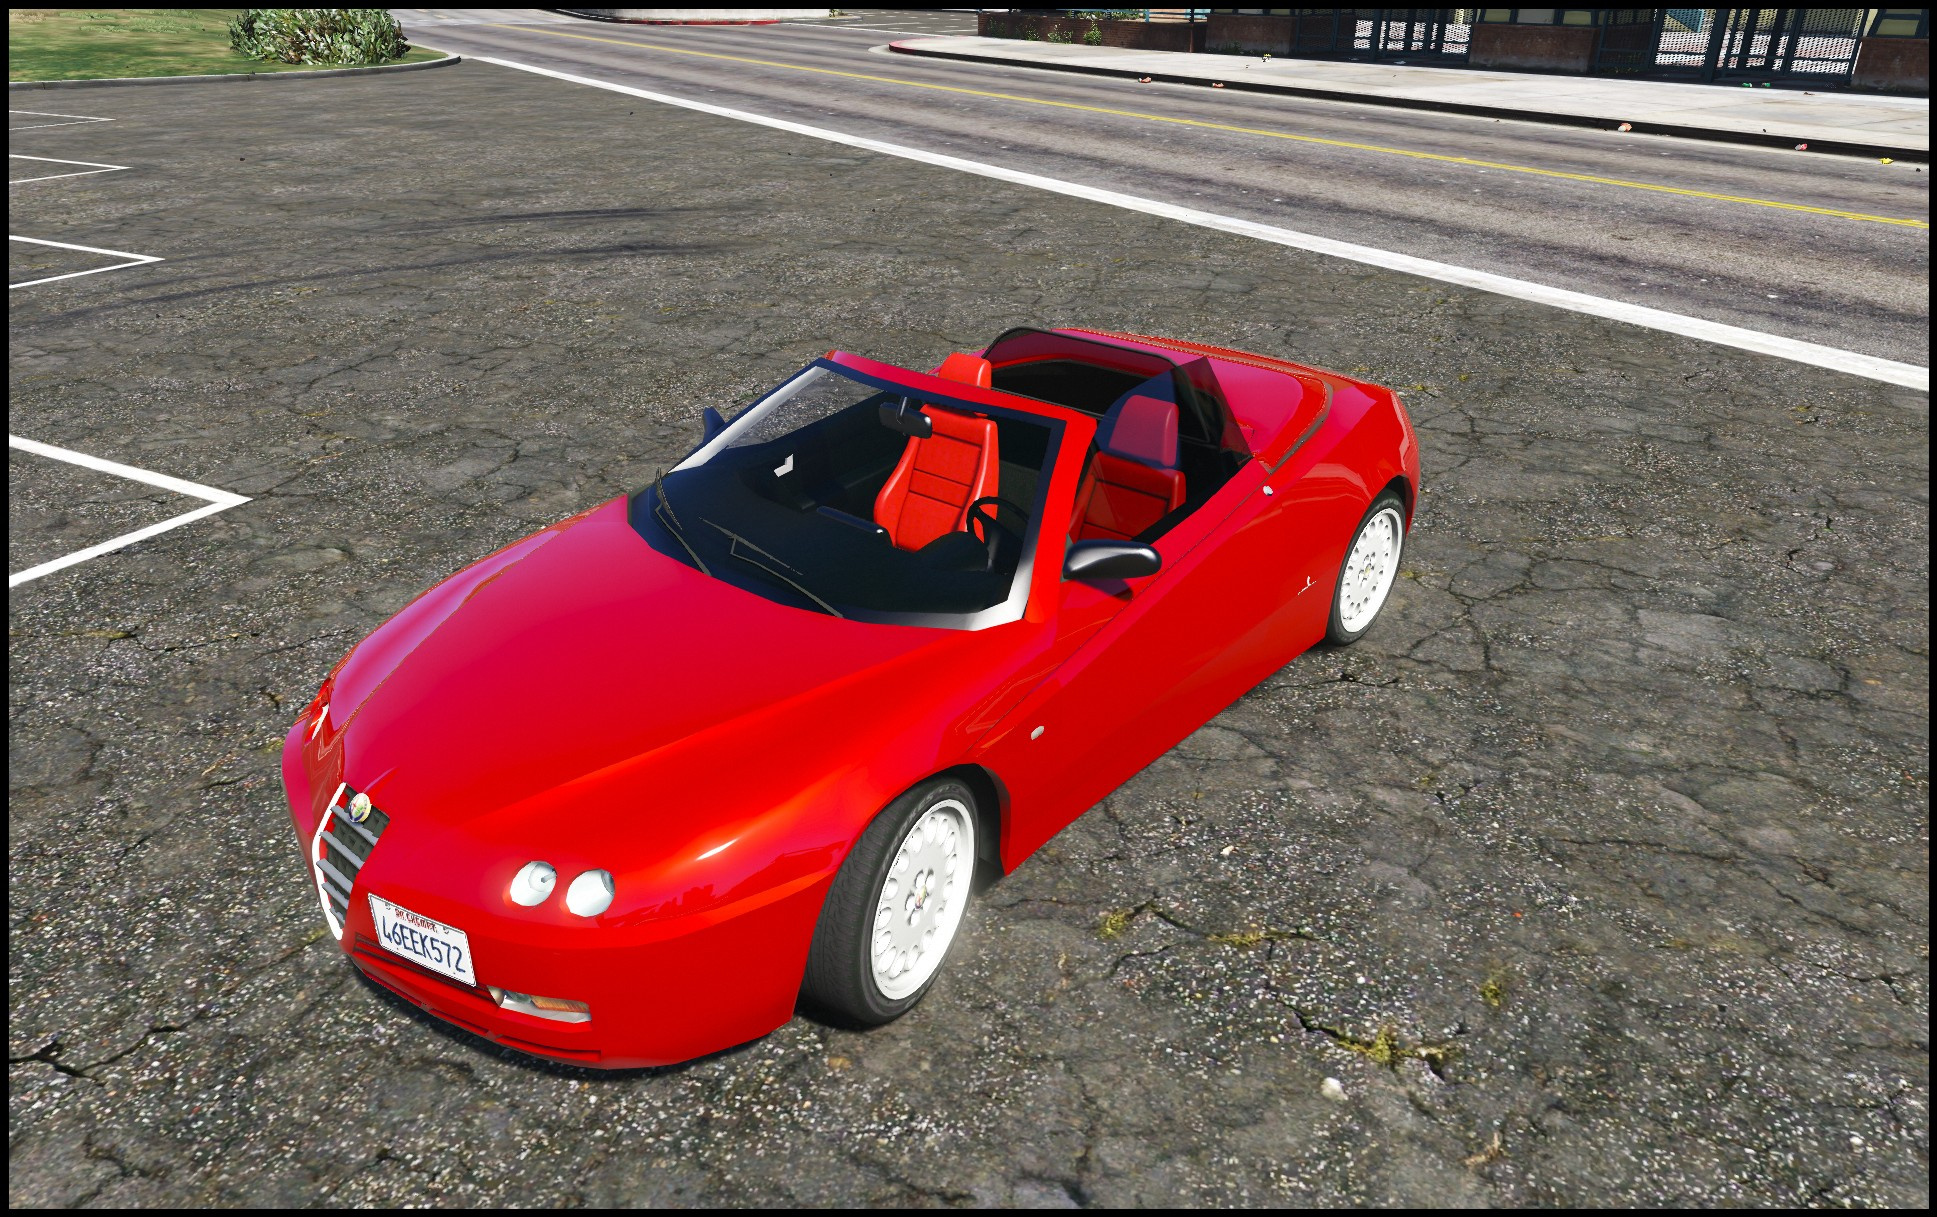 Alfa Romeo Spider 916 [Add Replace] GTA5 Mods